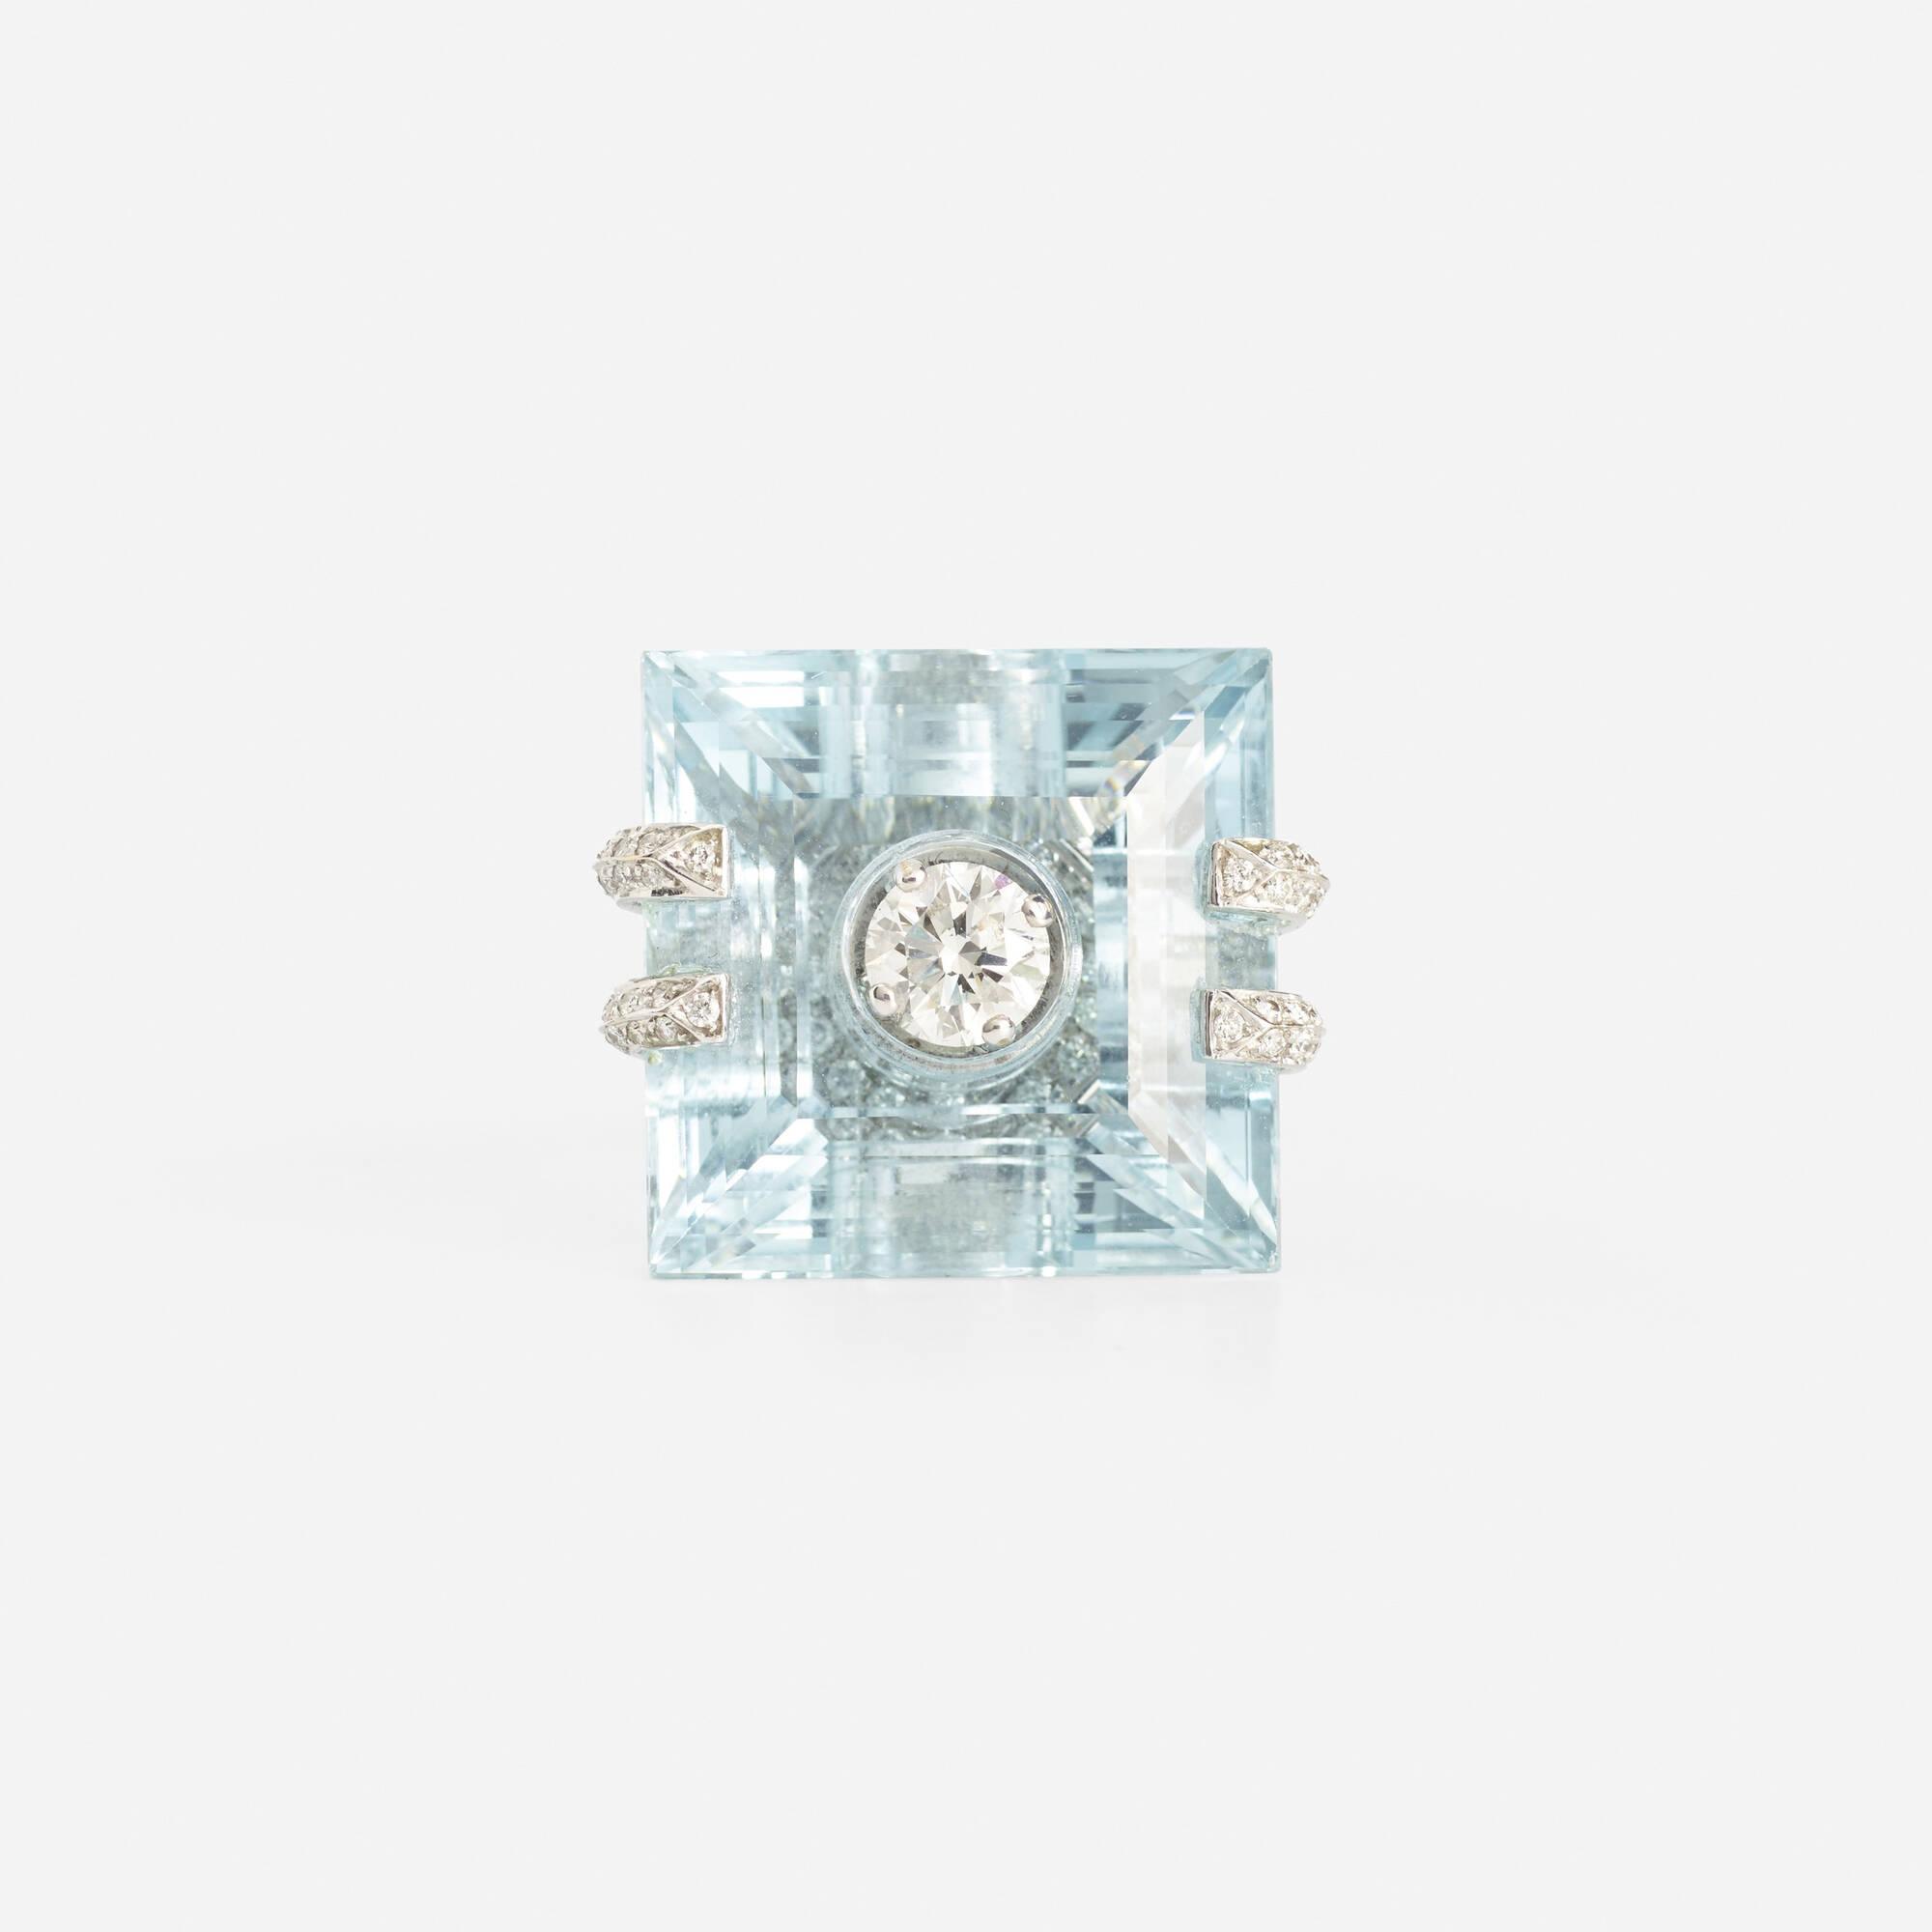 108: Corvino / A gold, aquamarine and diamond ring (2 of 3)